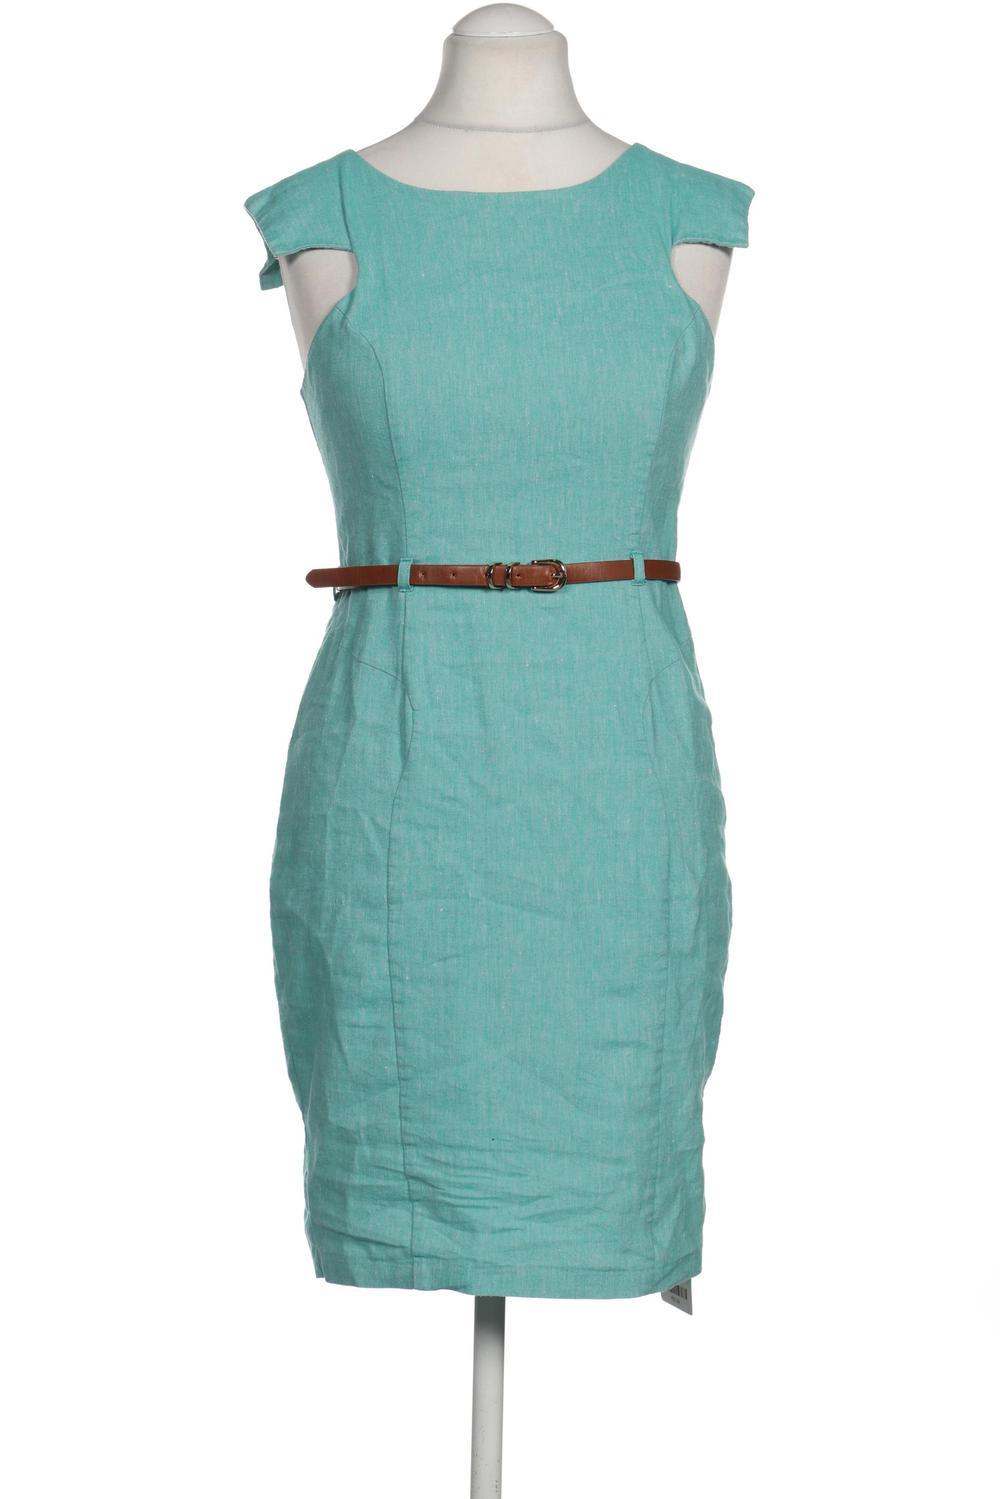 asos Kleid Damen Dress Damenkleid Gr. DE 40 Elasthan ...